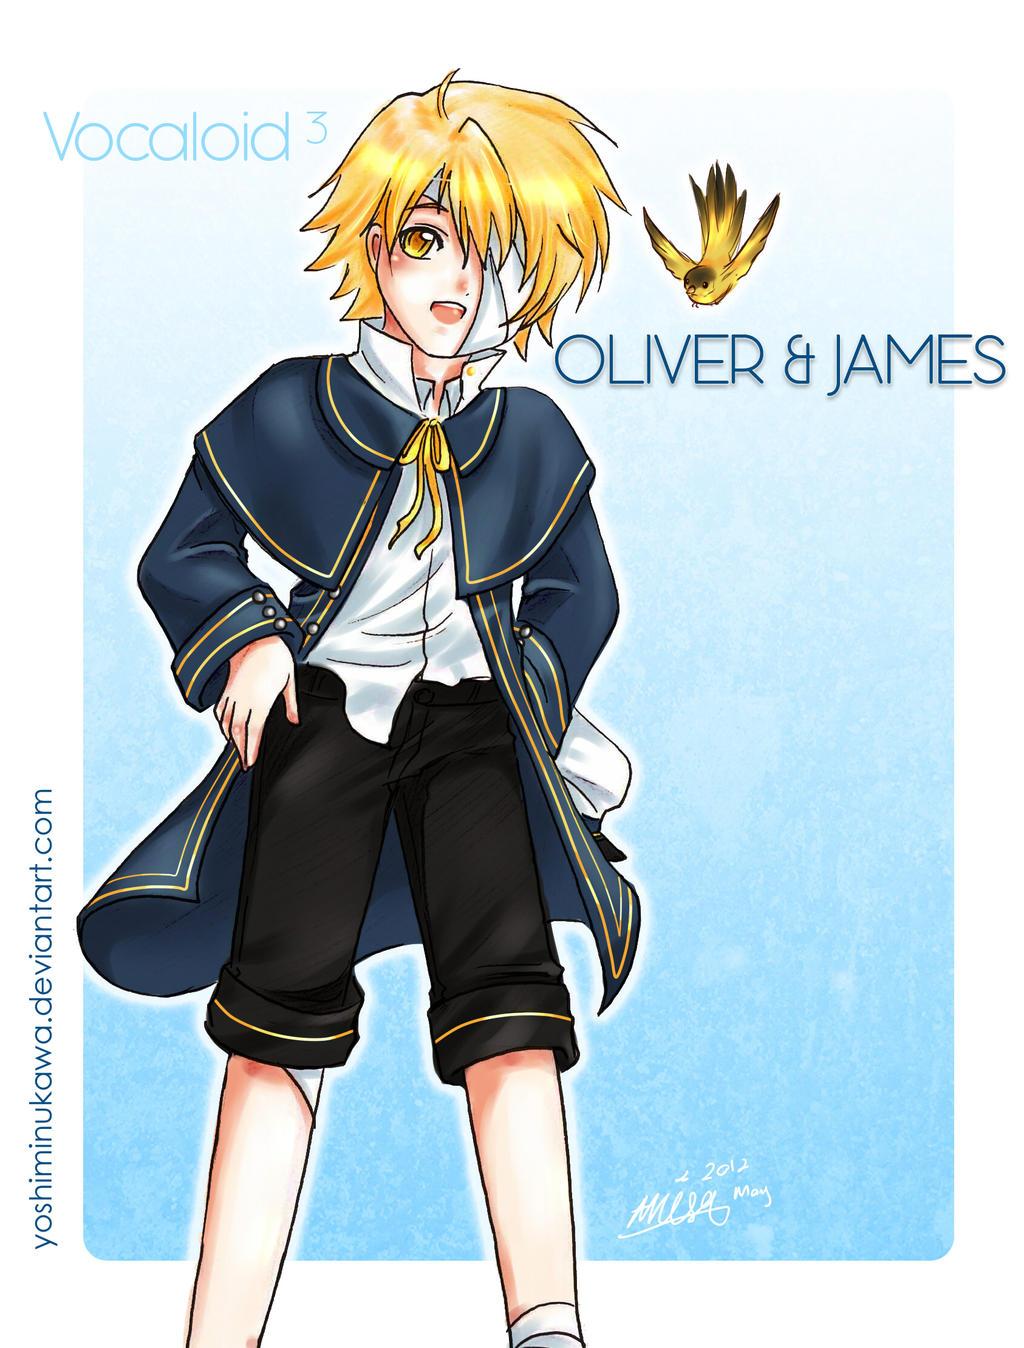 Vocaloid 3 Oliver by yuzuhana on DeviantArt